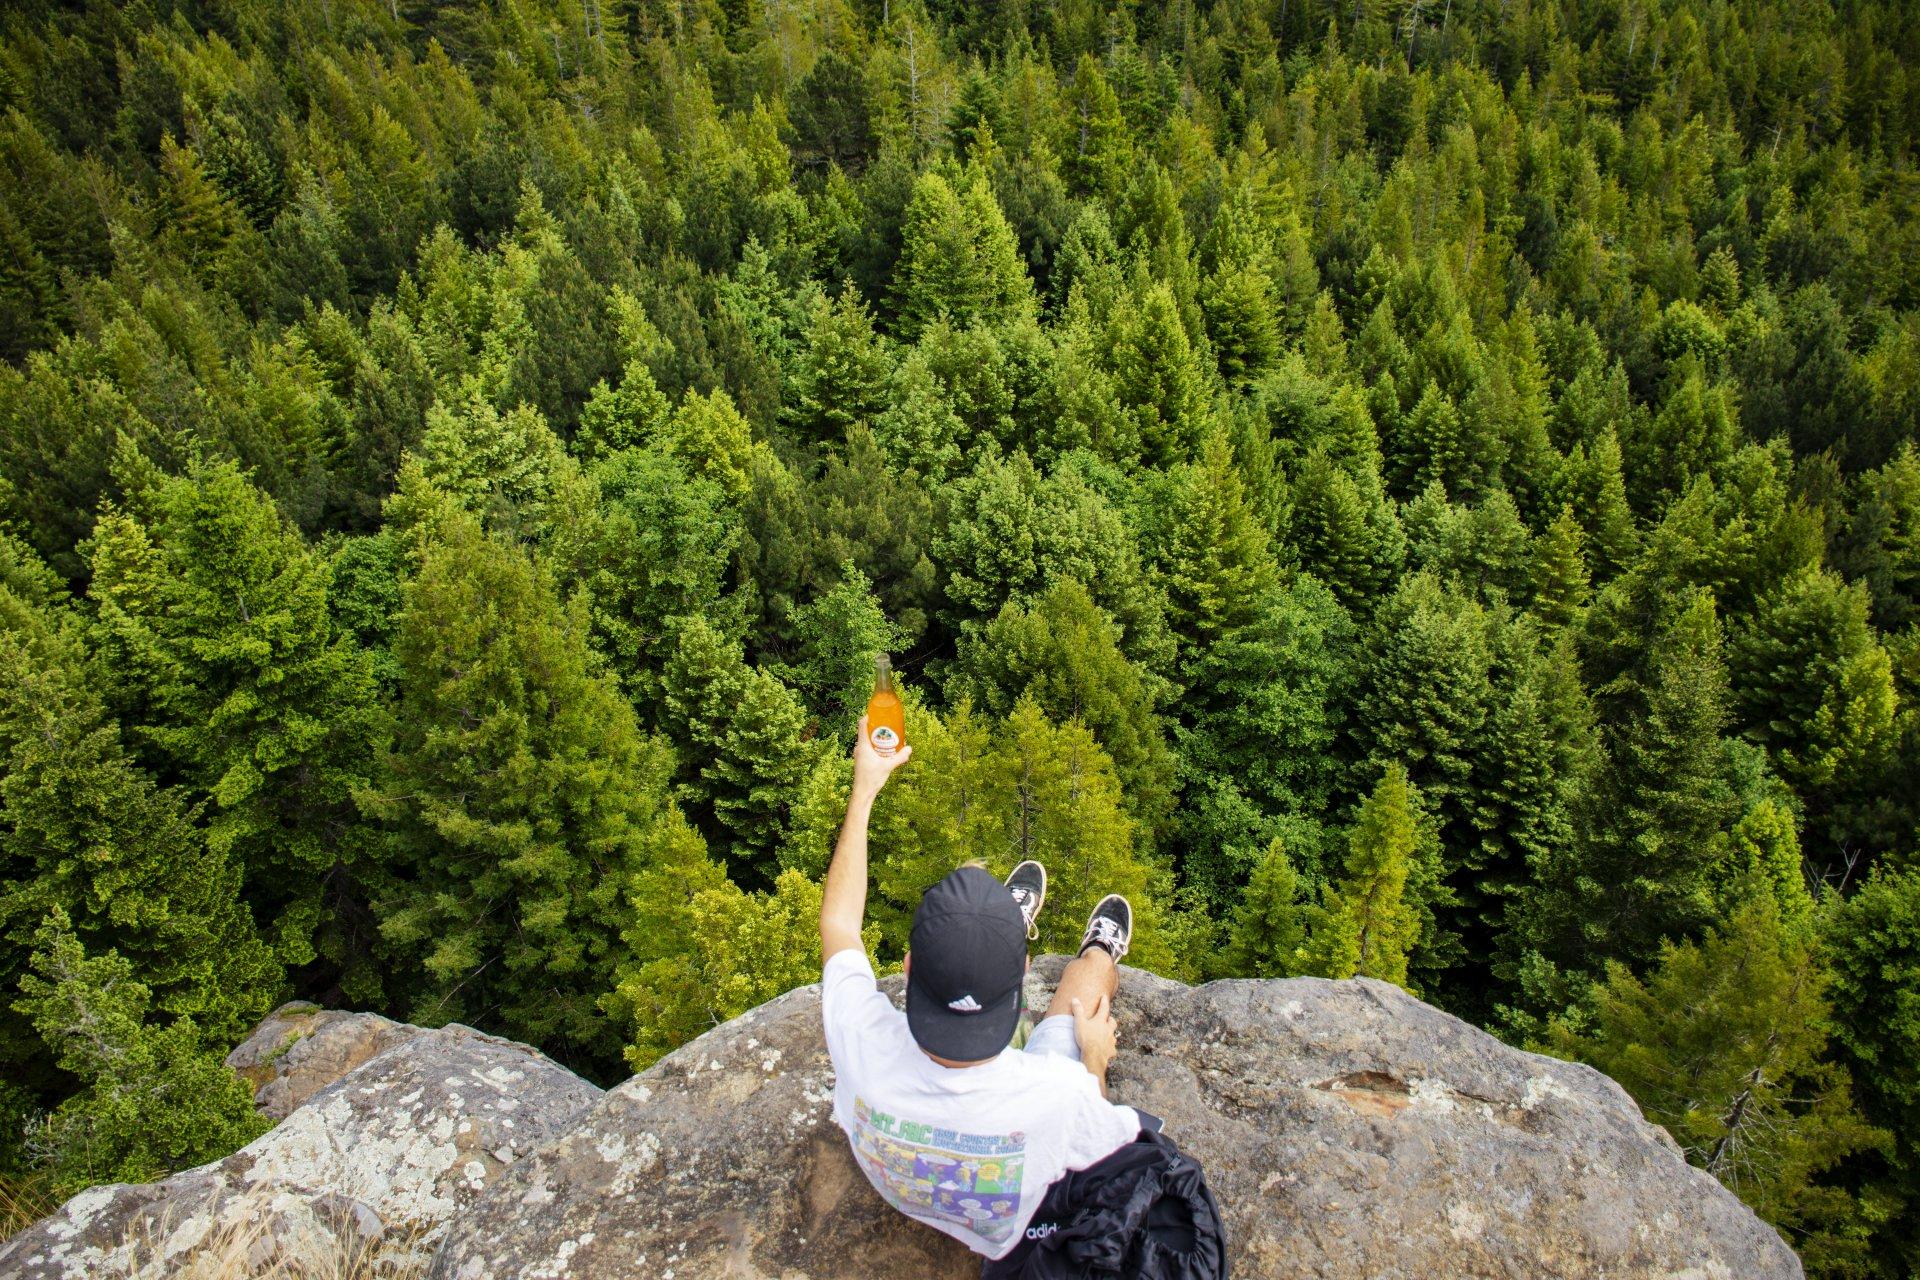 Humboldt State student Evan Ledesma at Strawberry Rock on June 11, 2020. | Photo by Elliott Portillo